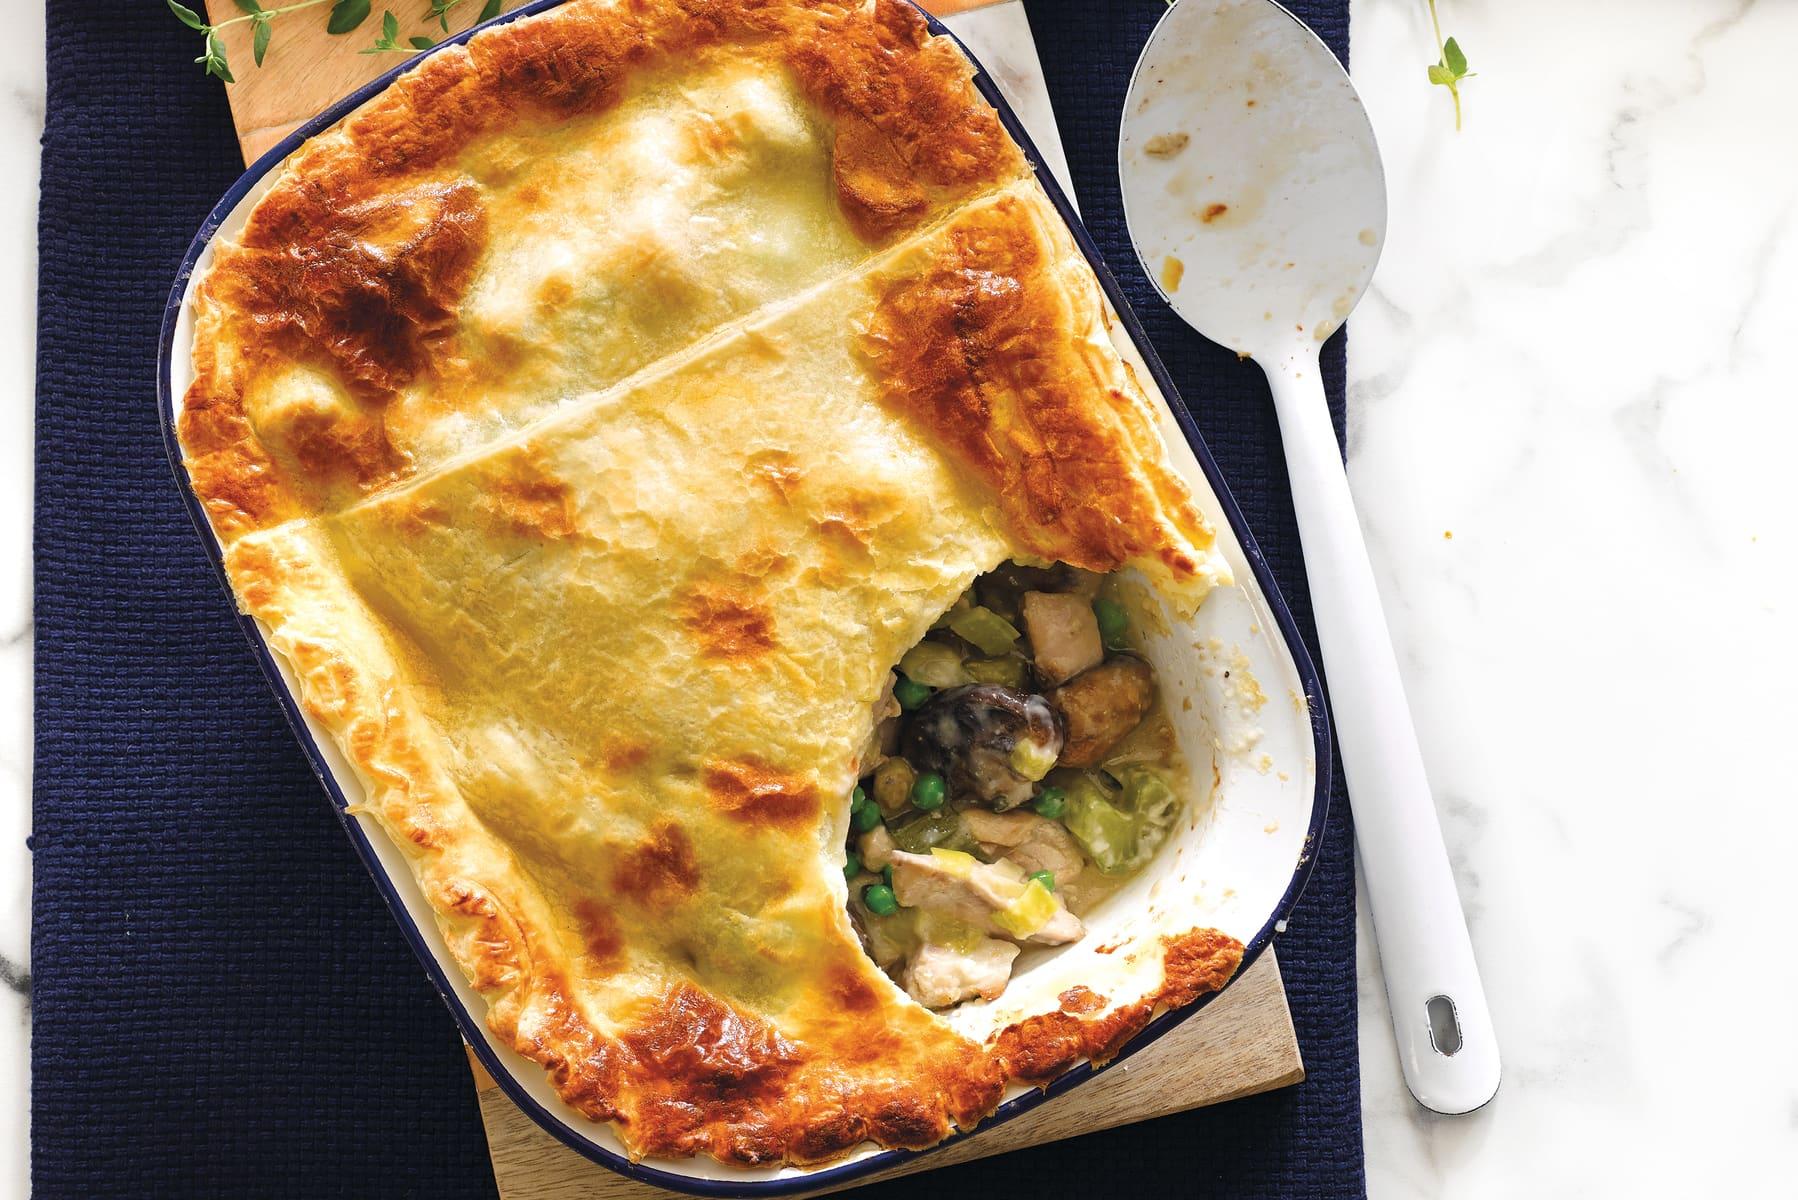 Healthy chicken recipes healthy food guide chicken leek and mushroom pie forumfinder Choice Image